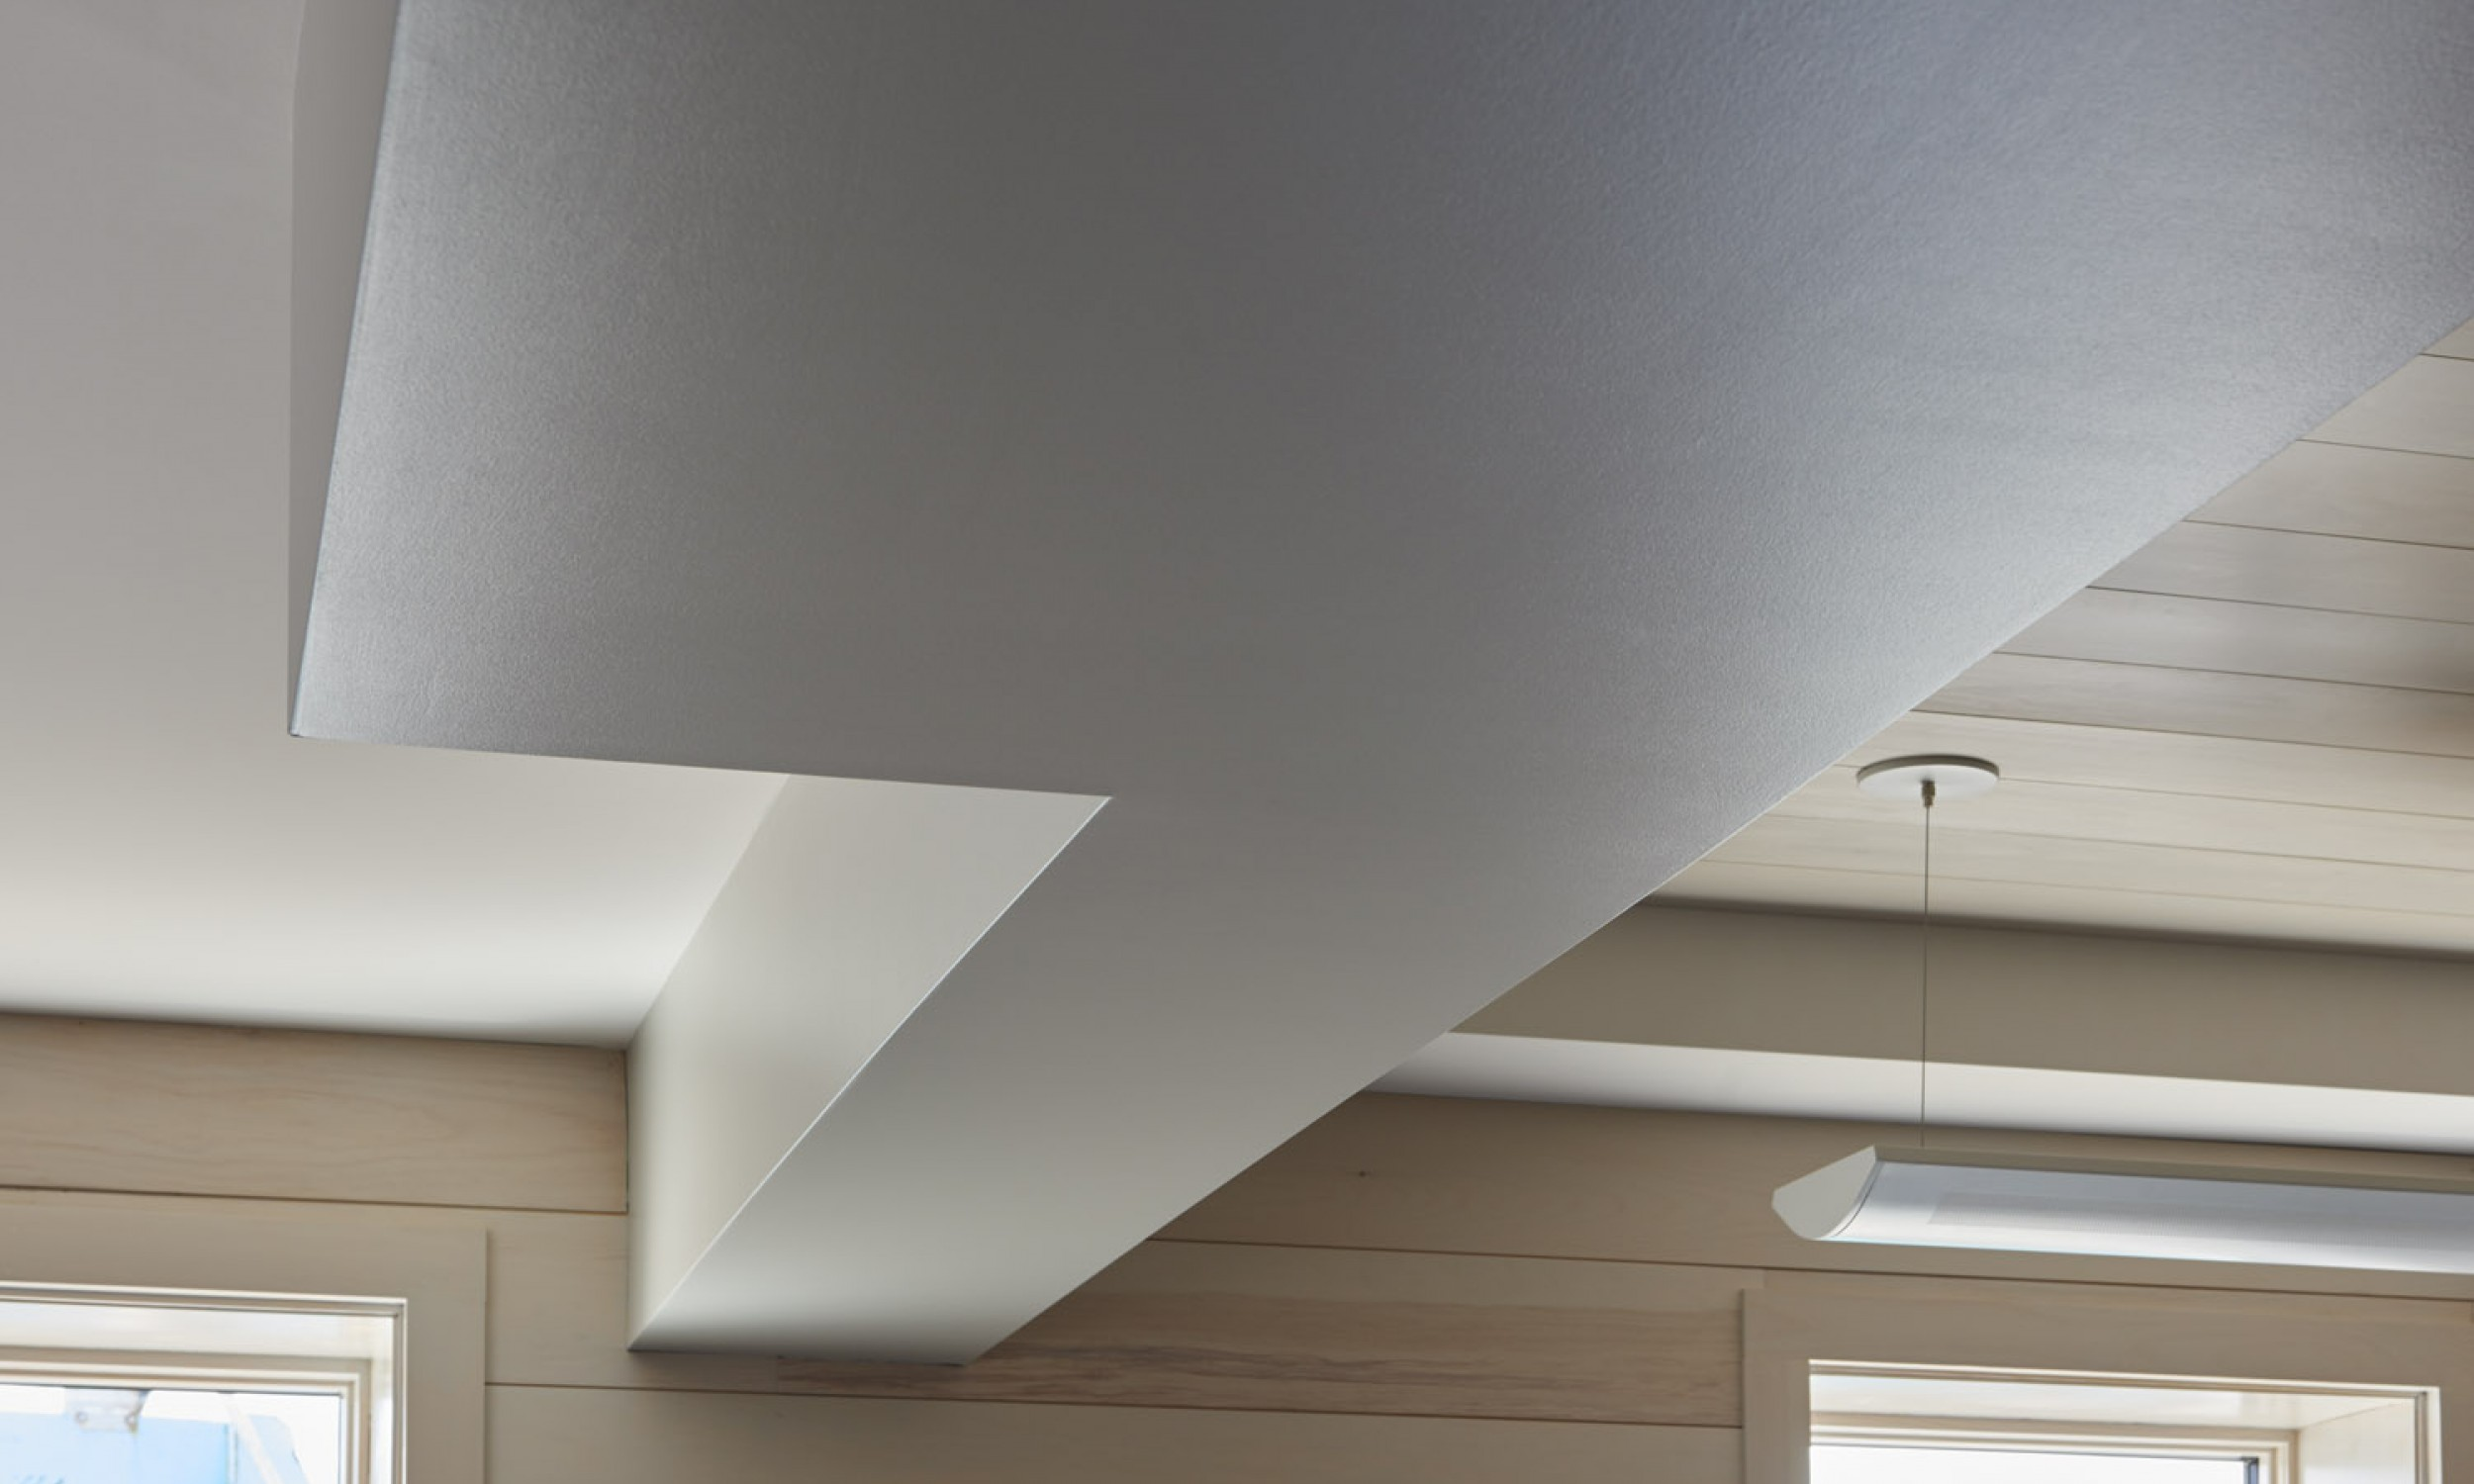 Ceiling Detail, Drywall detail